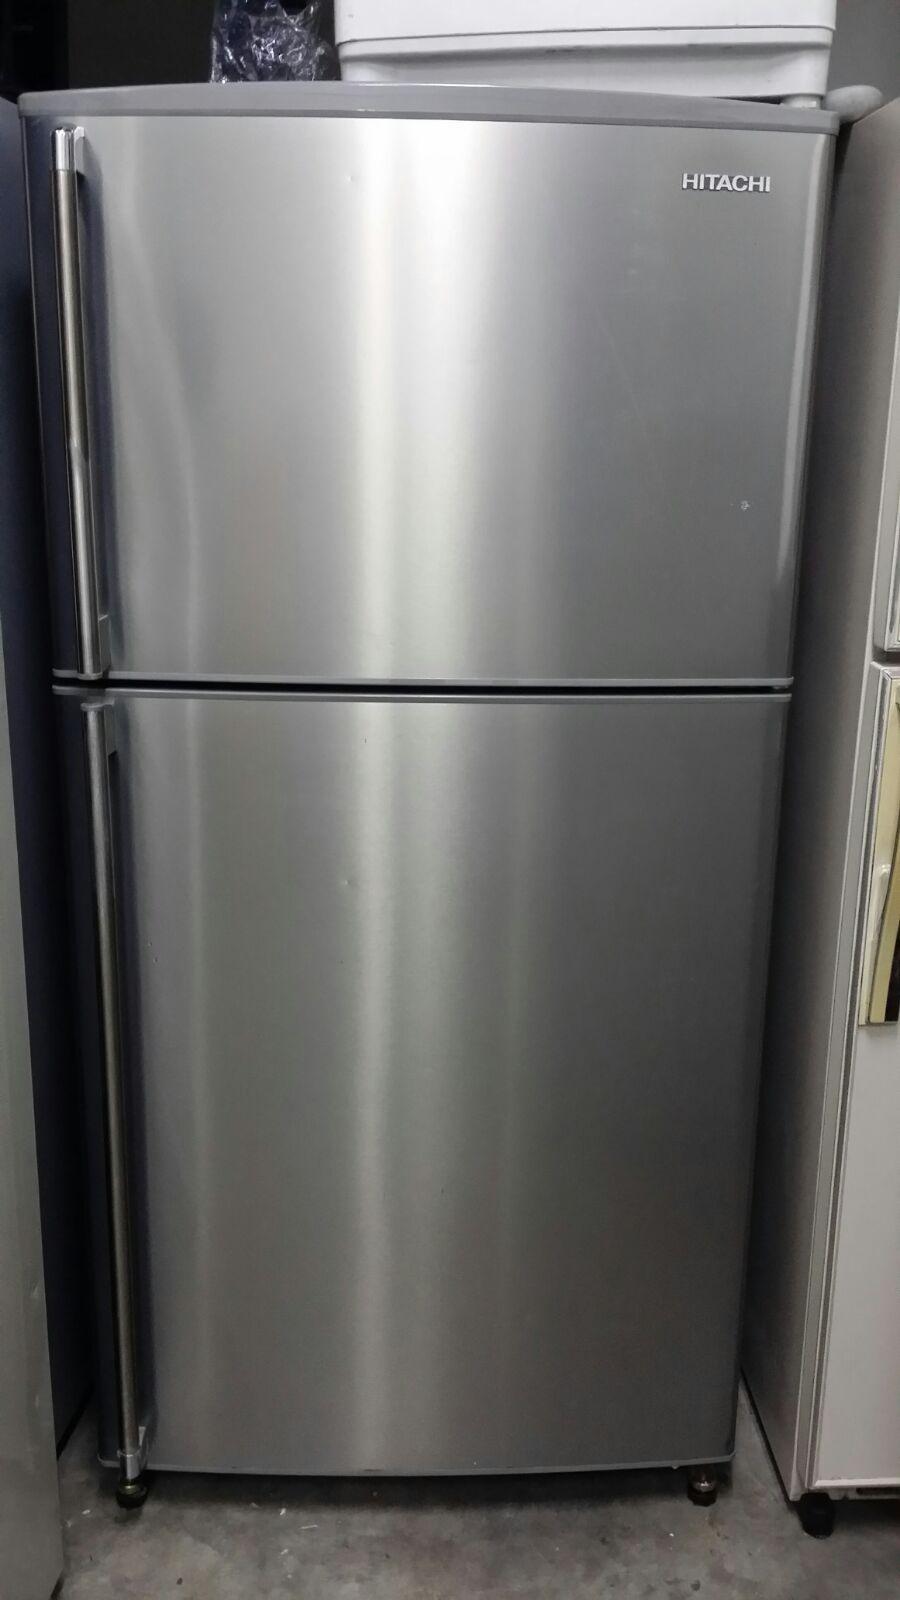 hitachi refrigerator 2016. hitachi fridge refrigerator ais peti sejuk freezer refurbish 2 doors 2016 3